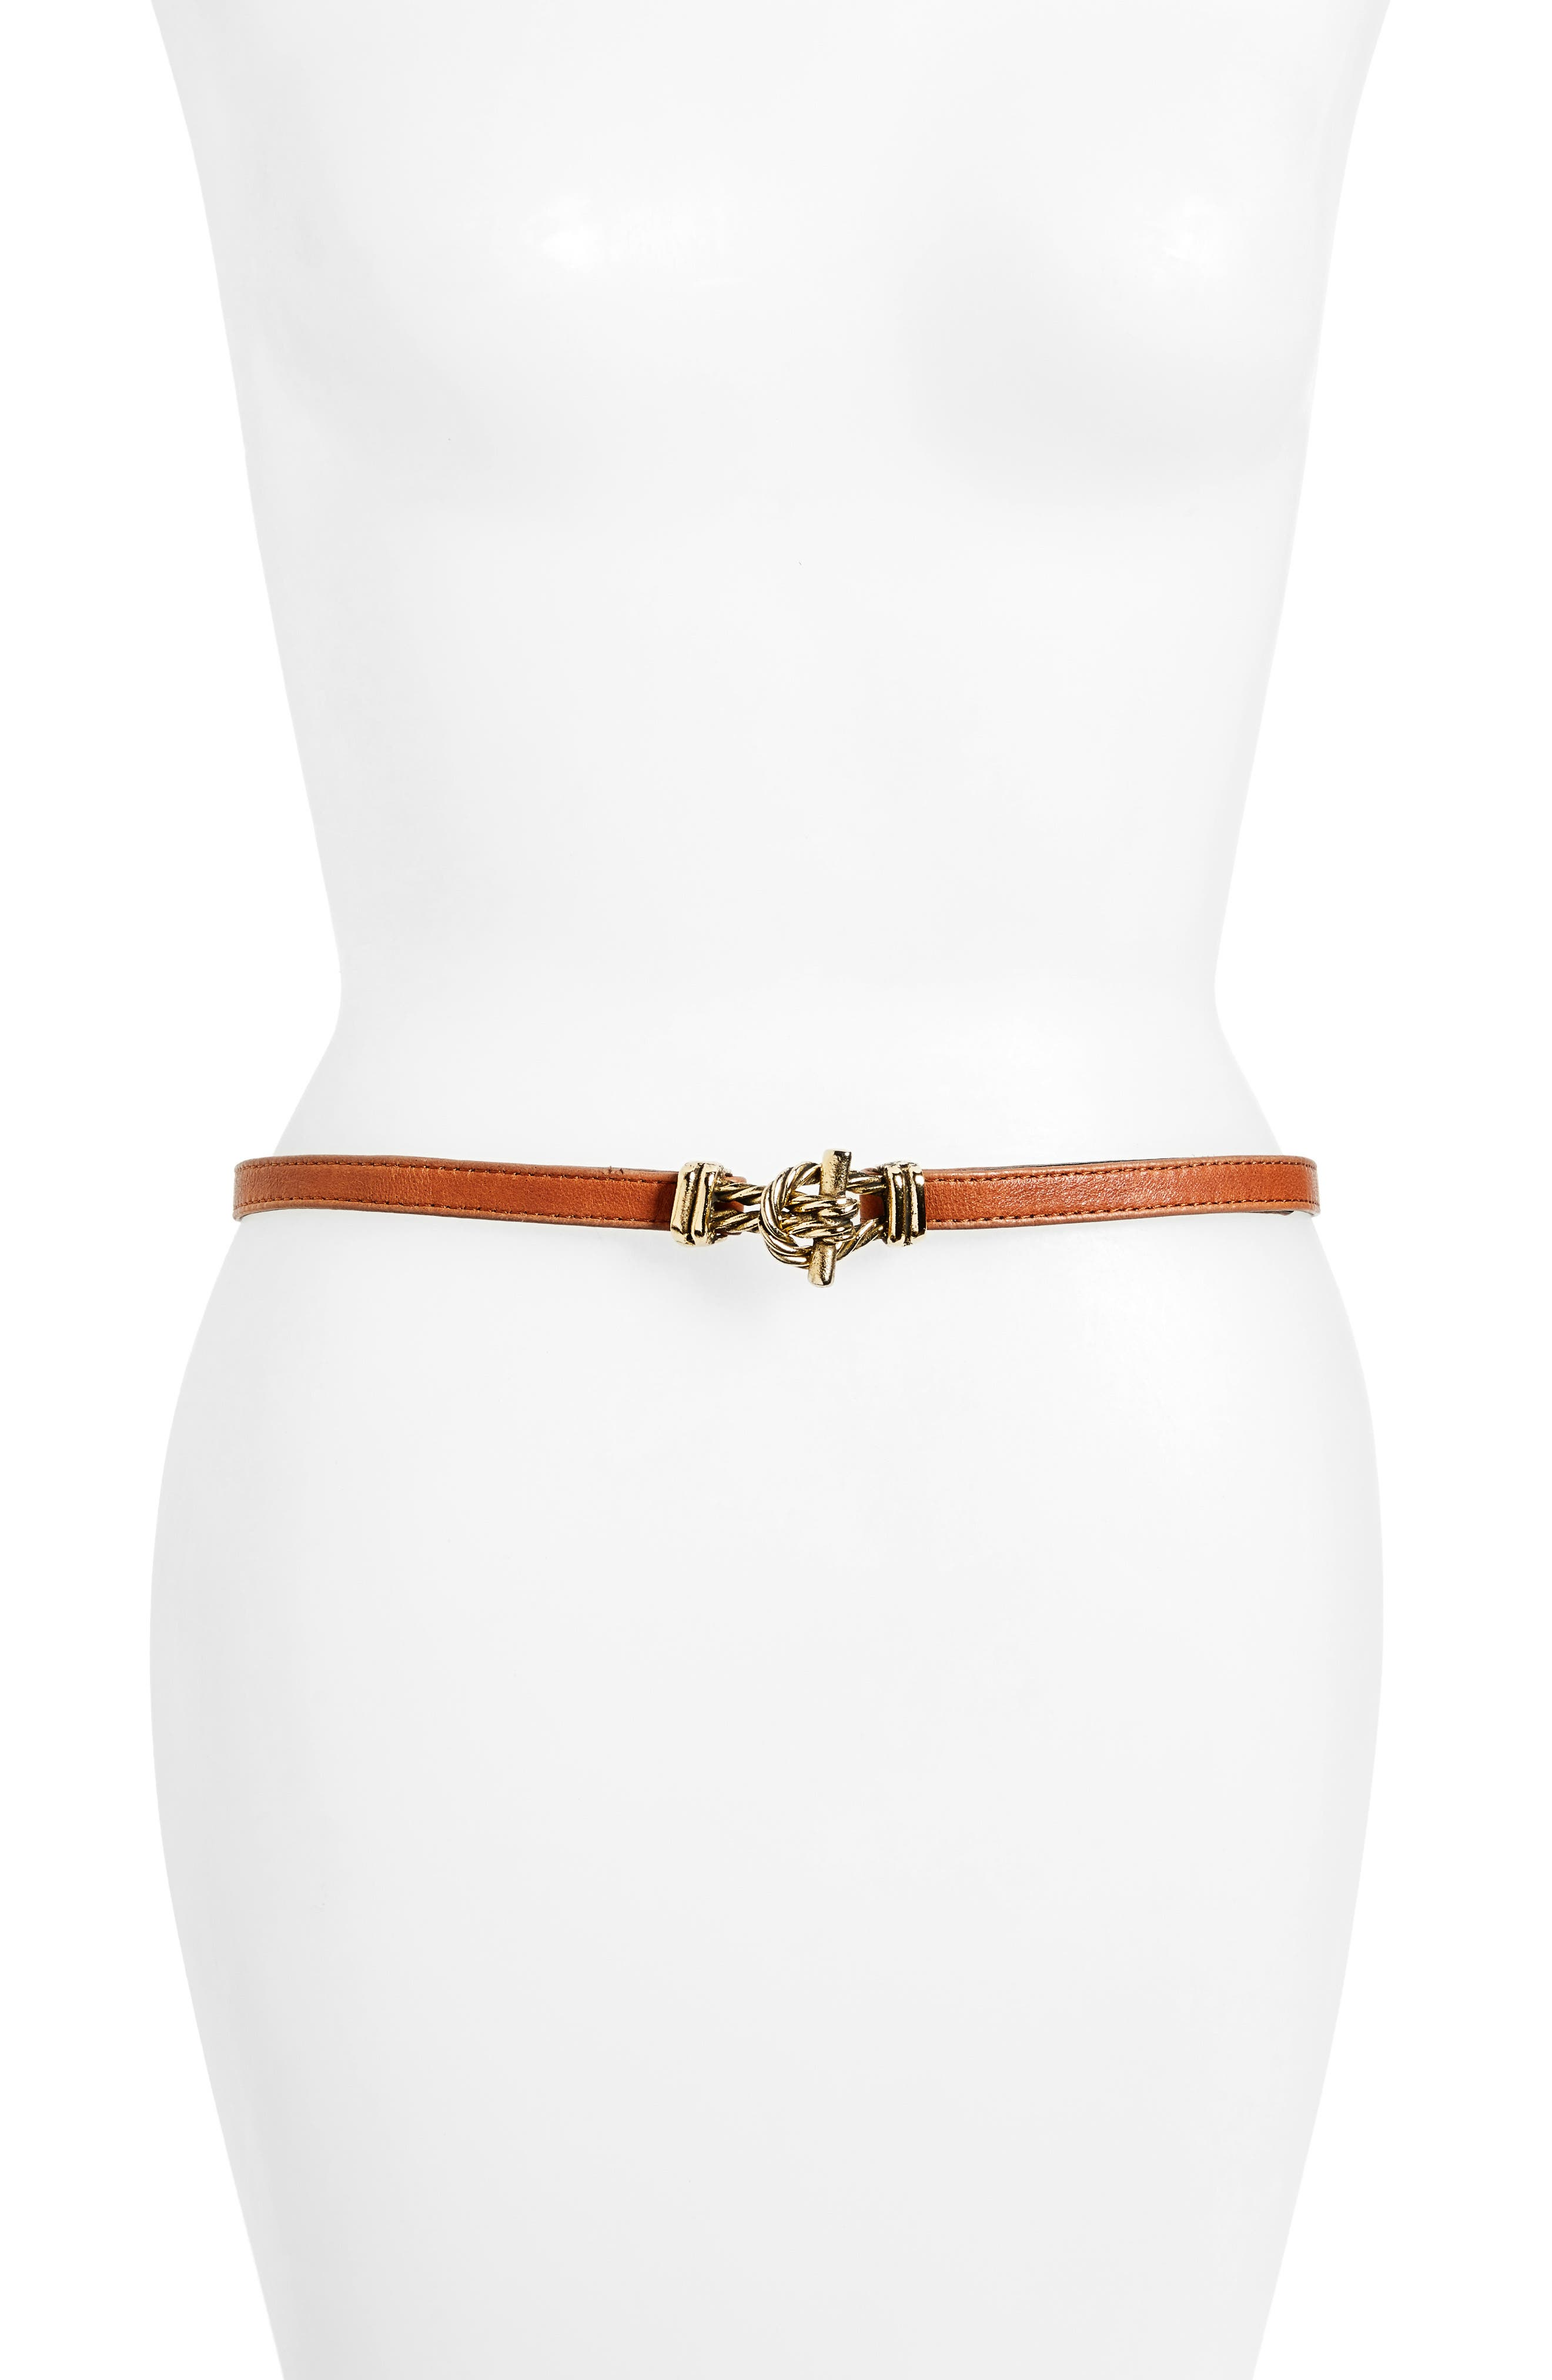 RAINA, Fitzgerald Leather Belt, Main thumbnail 1, color, COGNAC